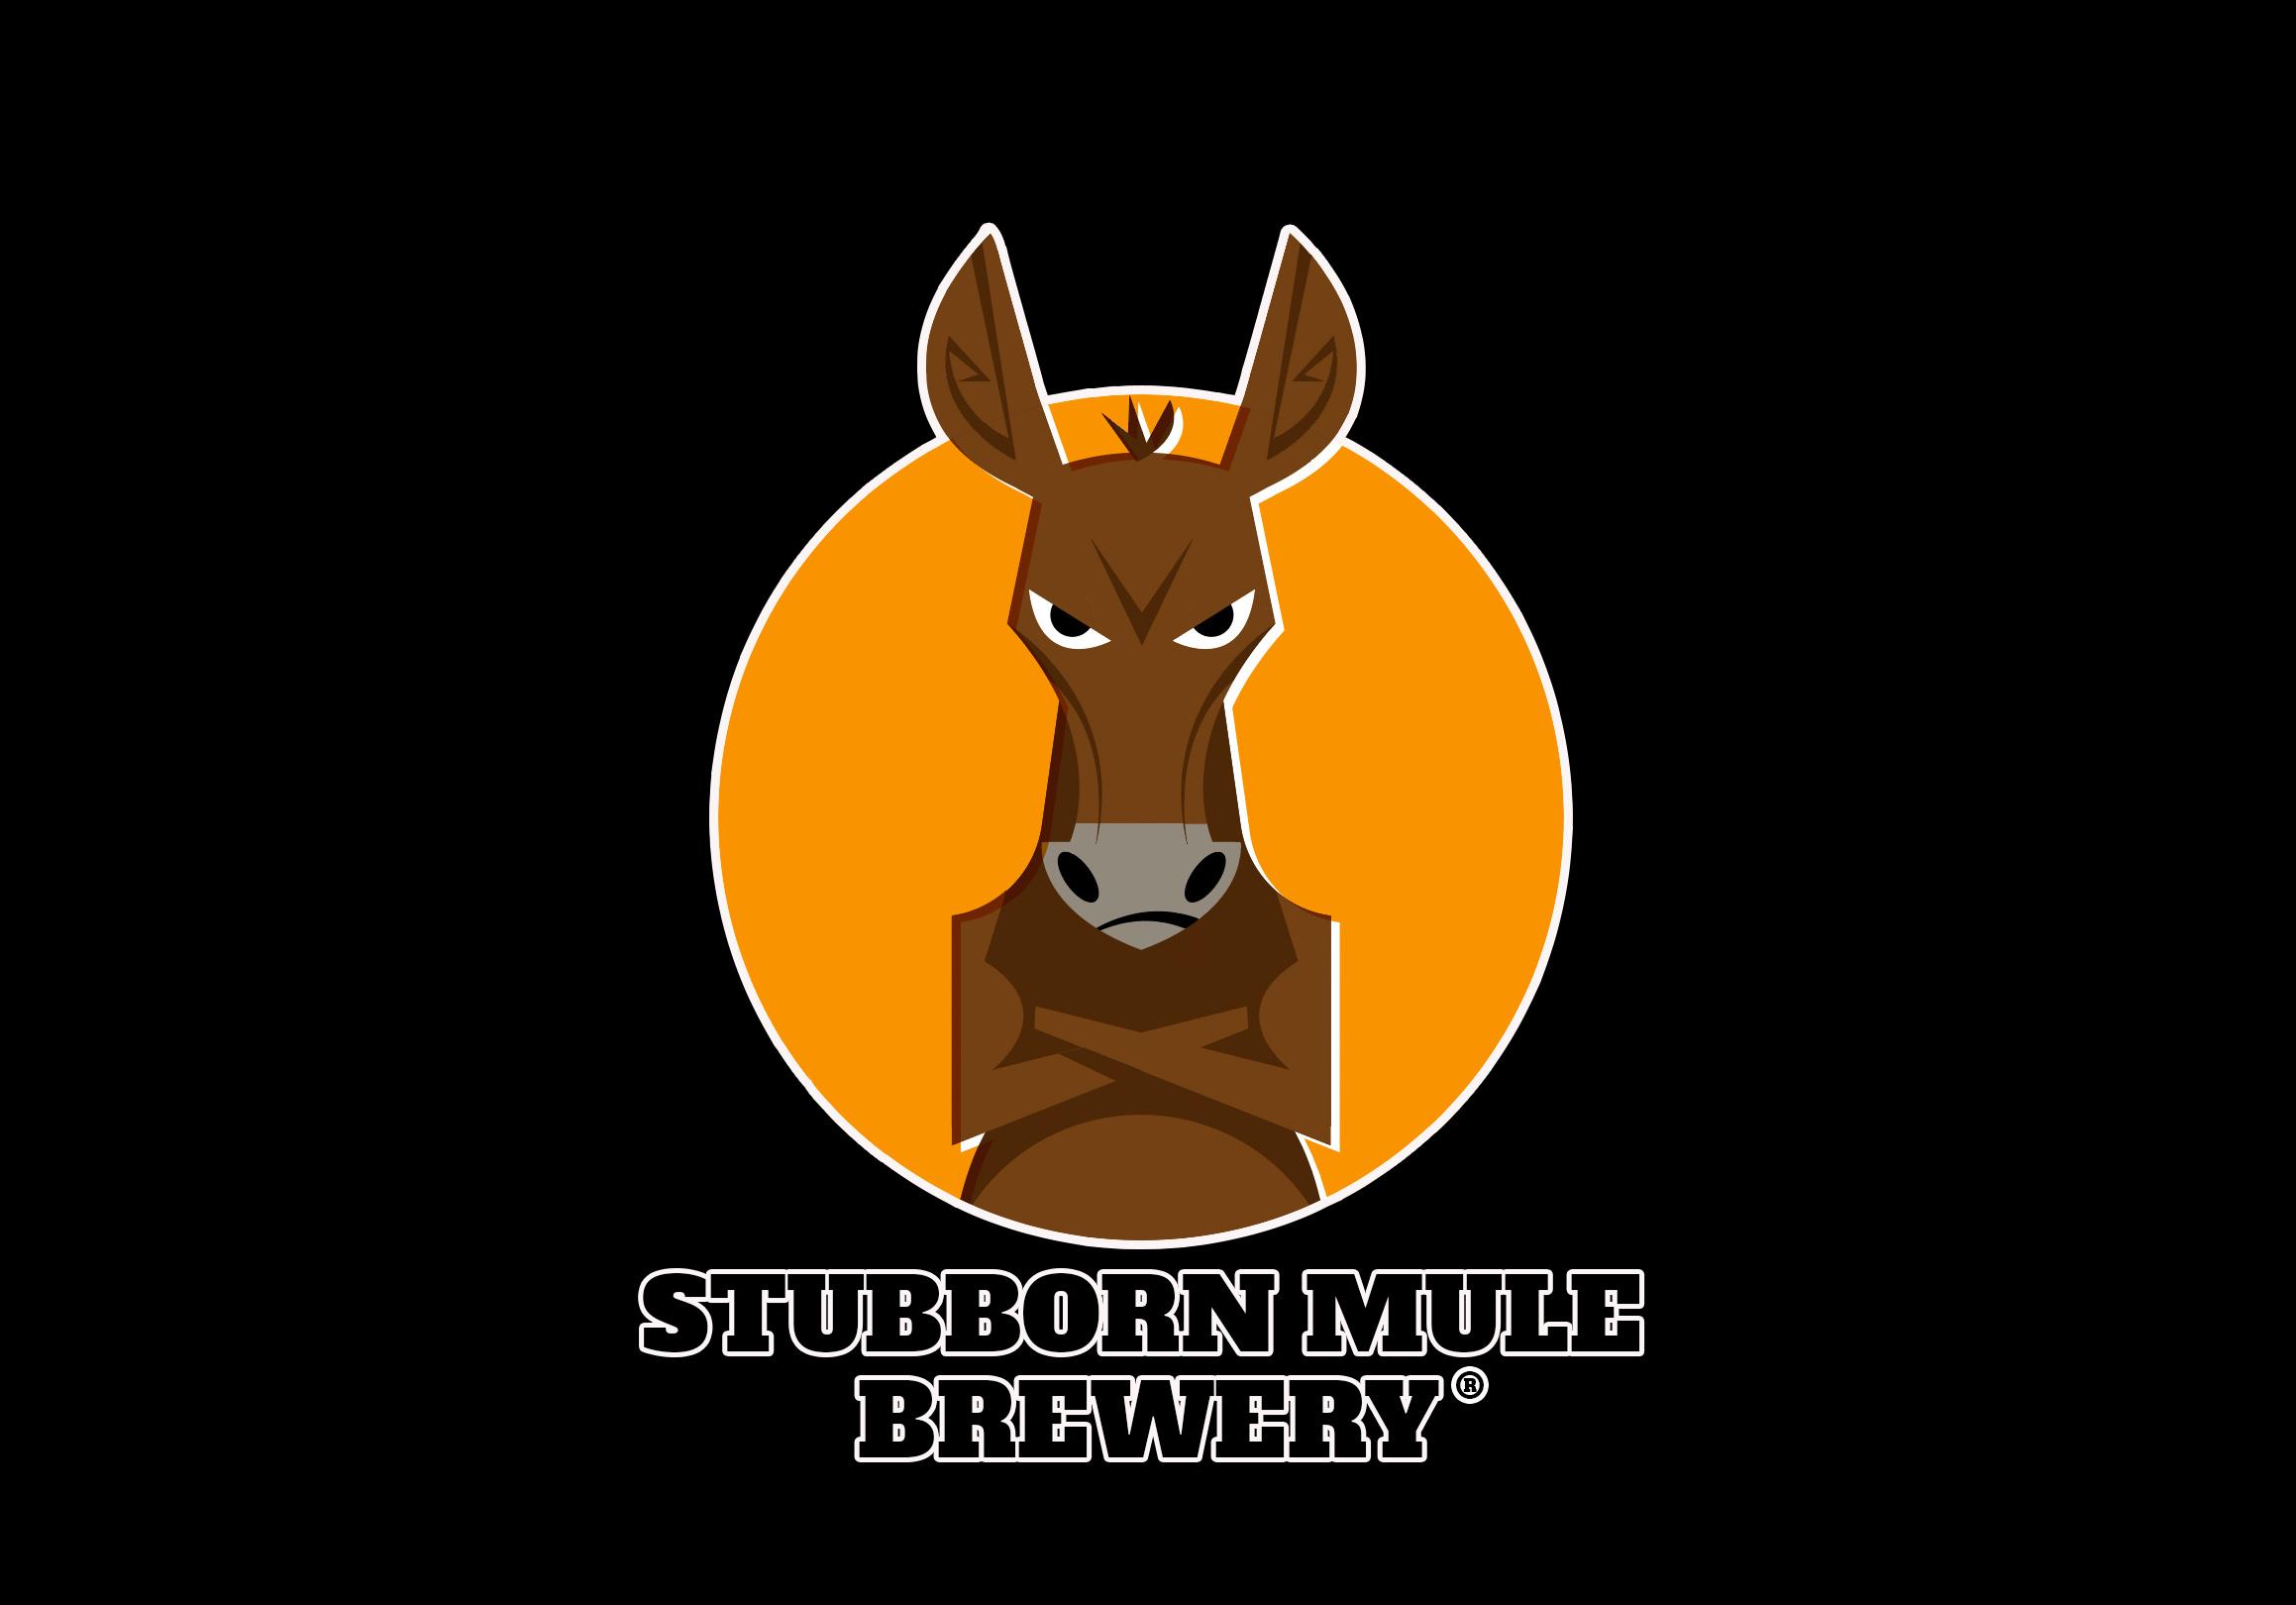 Stubborn Mule Brewery®